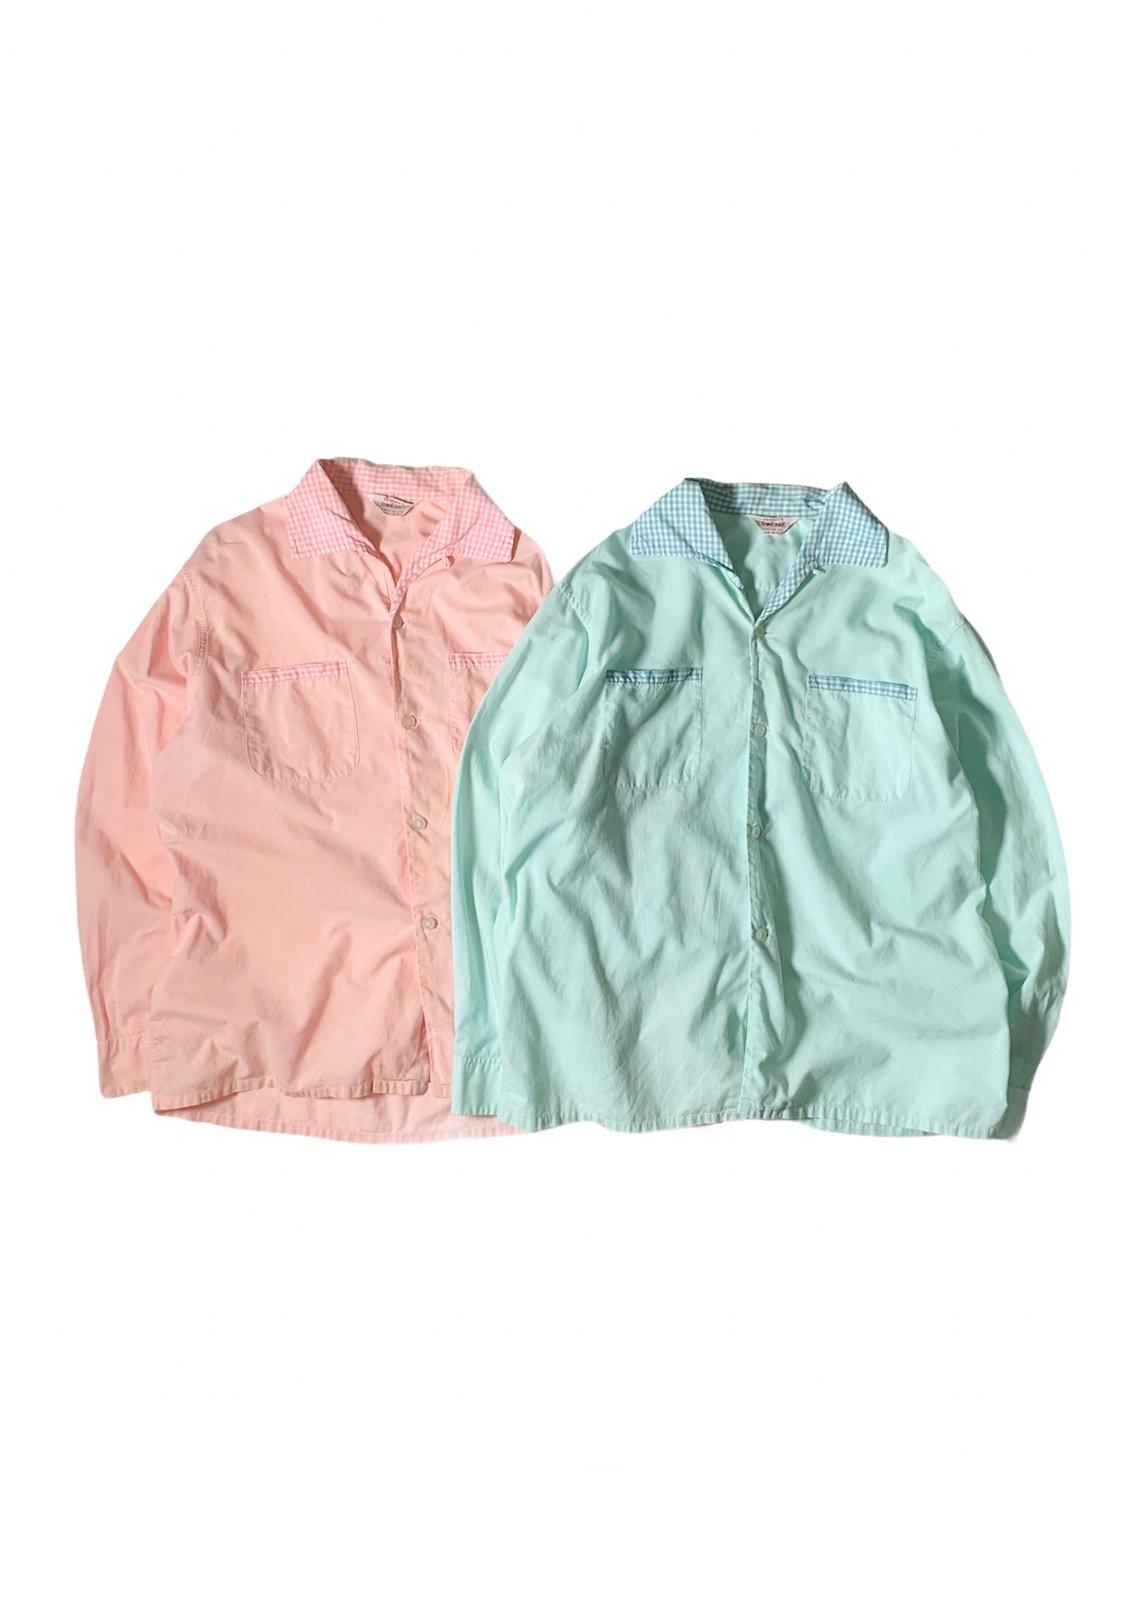 "I&I 古着 通販 ""PENNY'S TOWNCRAFT"" Pajama L/S Shirt 詳細画像5"